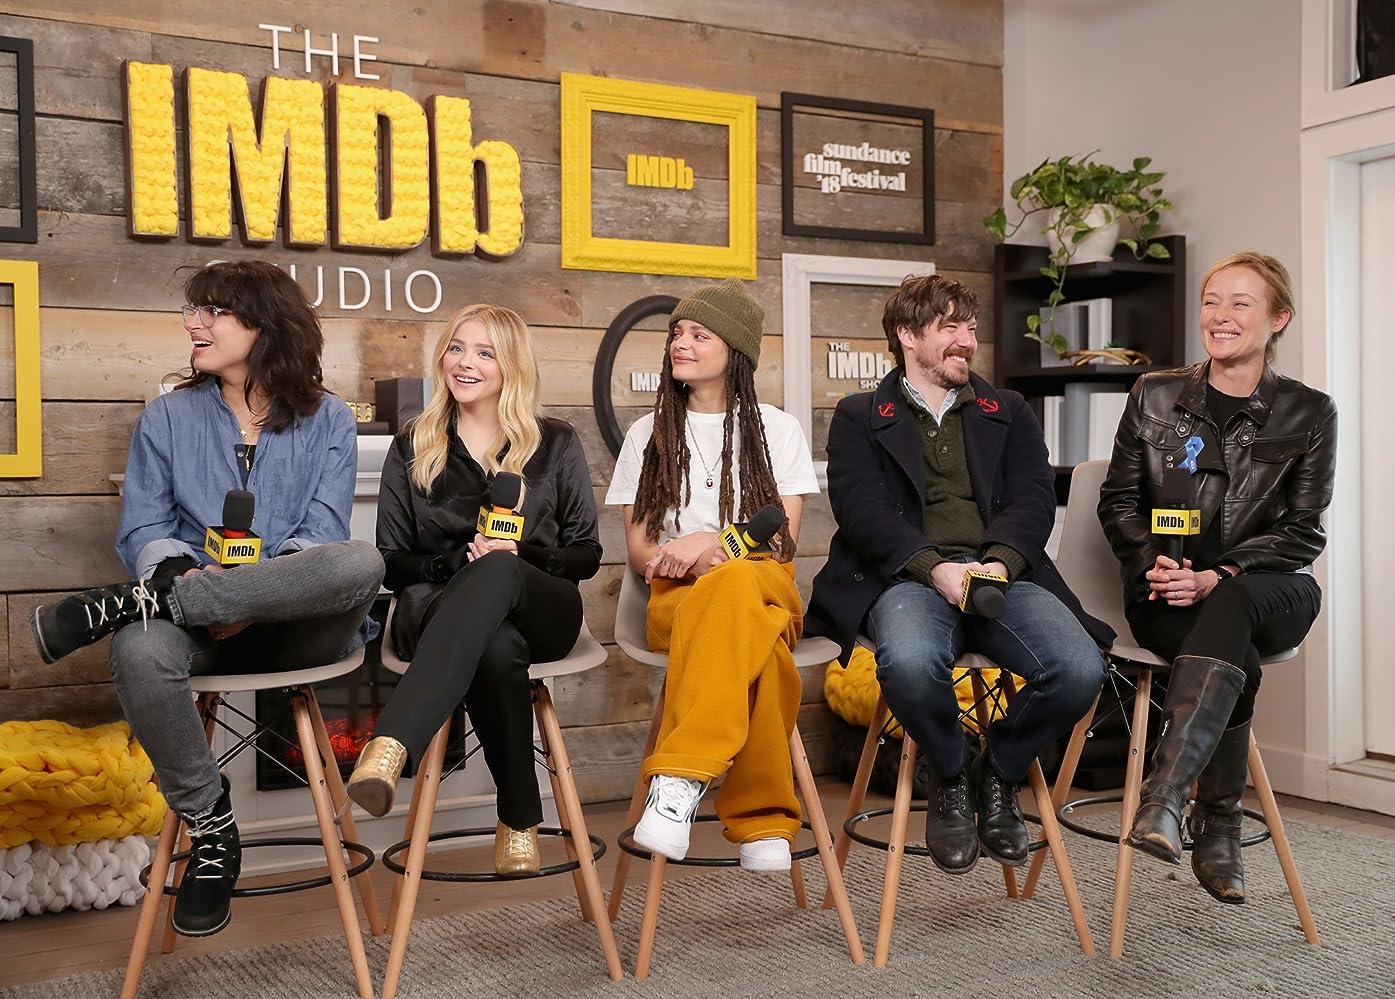 Jennifer Ehle, John Gallagher, Chloë Grace Moretz, Desiree Akhavan, and Sasha Lane at an event for The Miseducation of Cameron Post (2018)